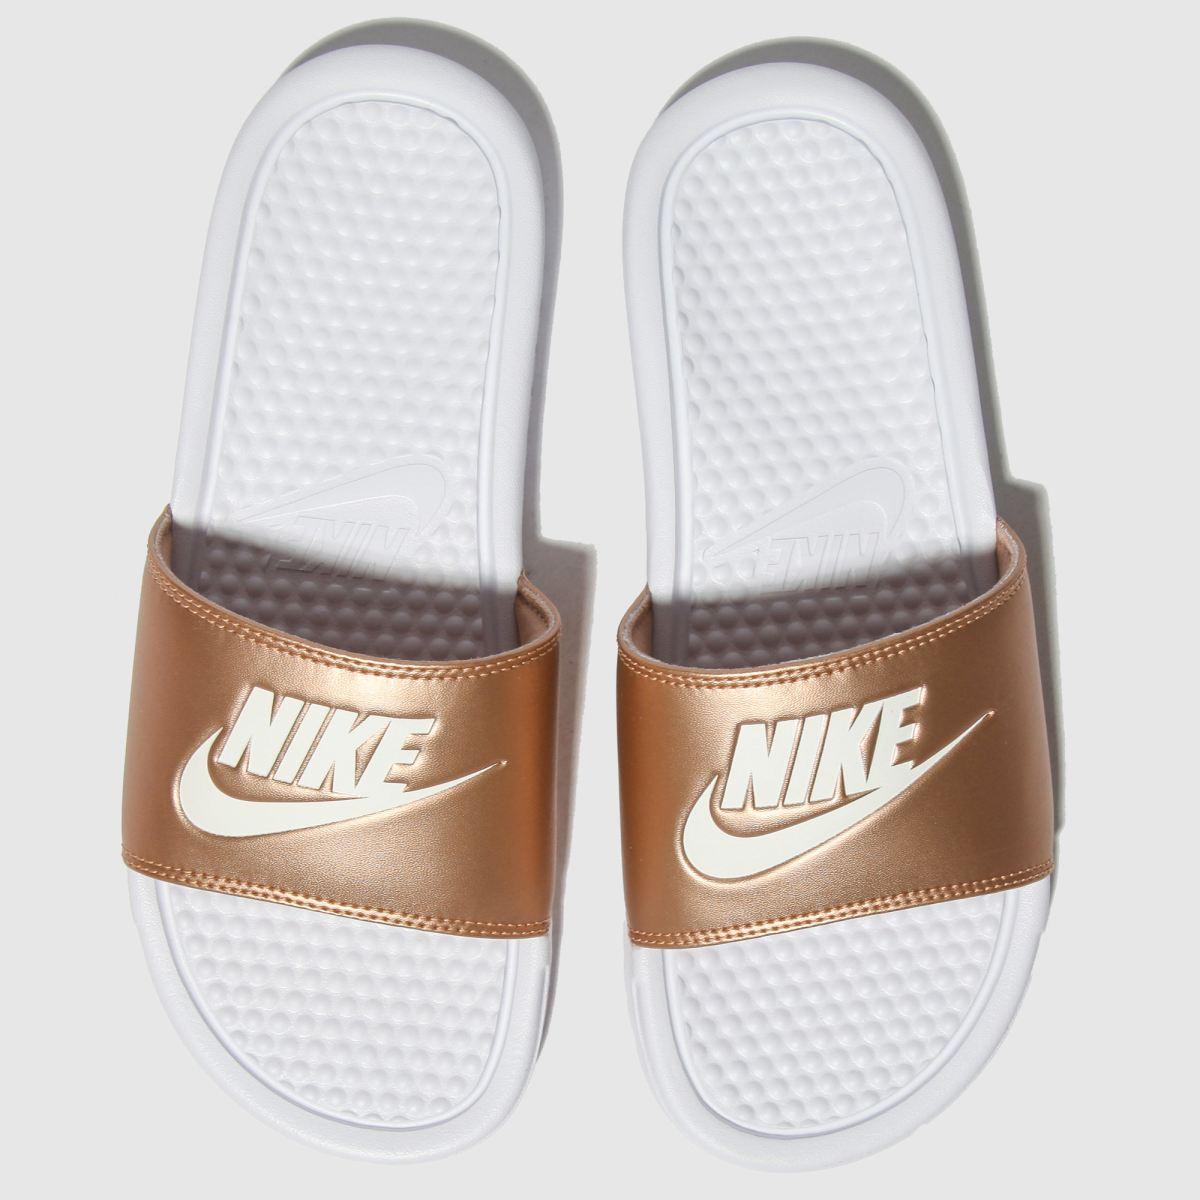 Nike Bronze Benassi Slider Sandals